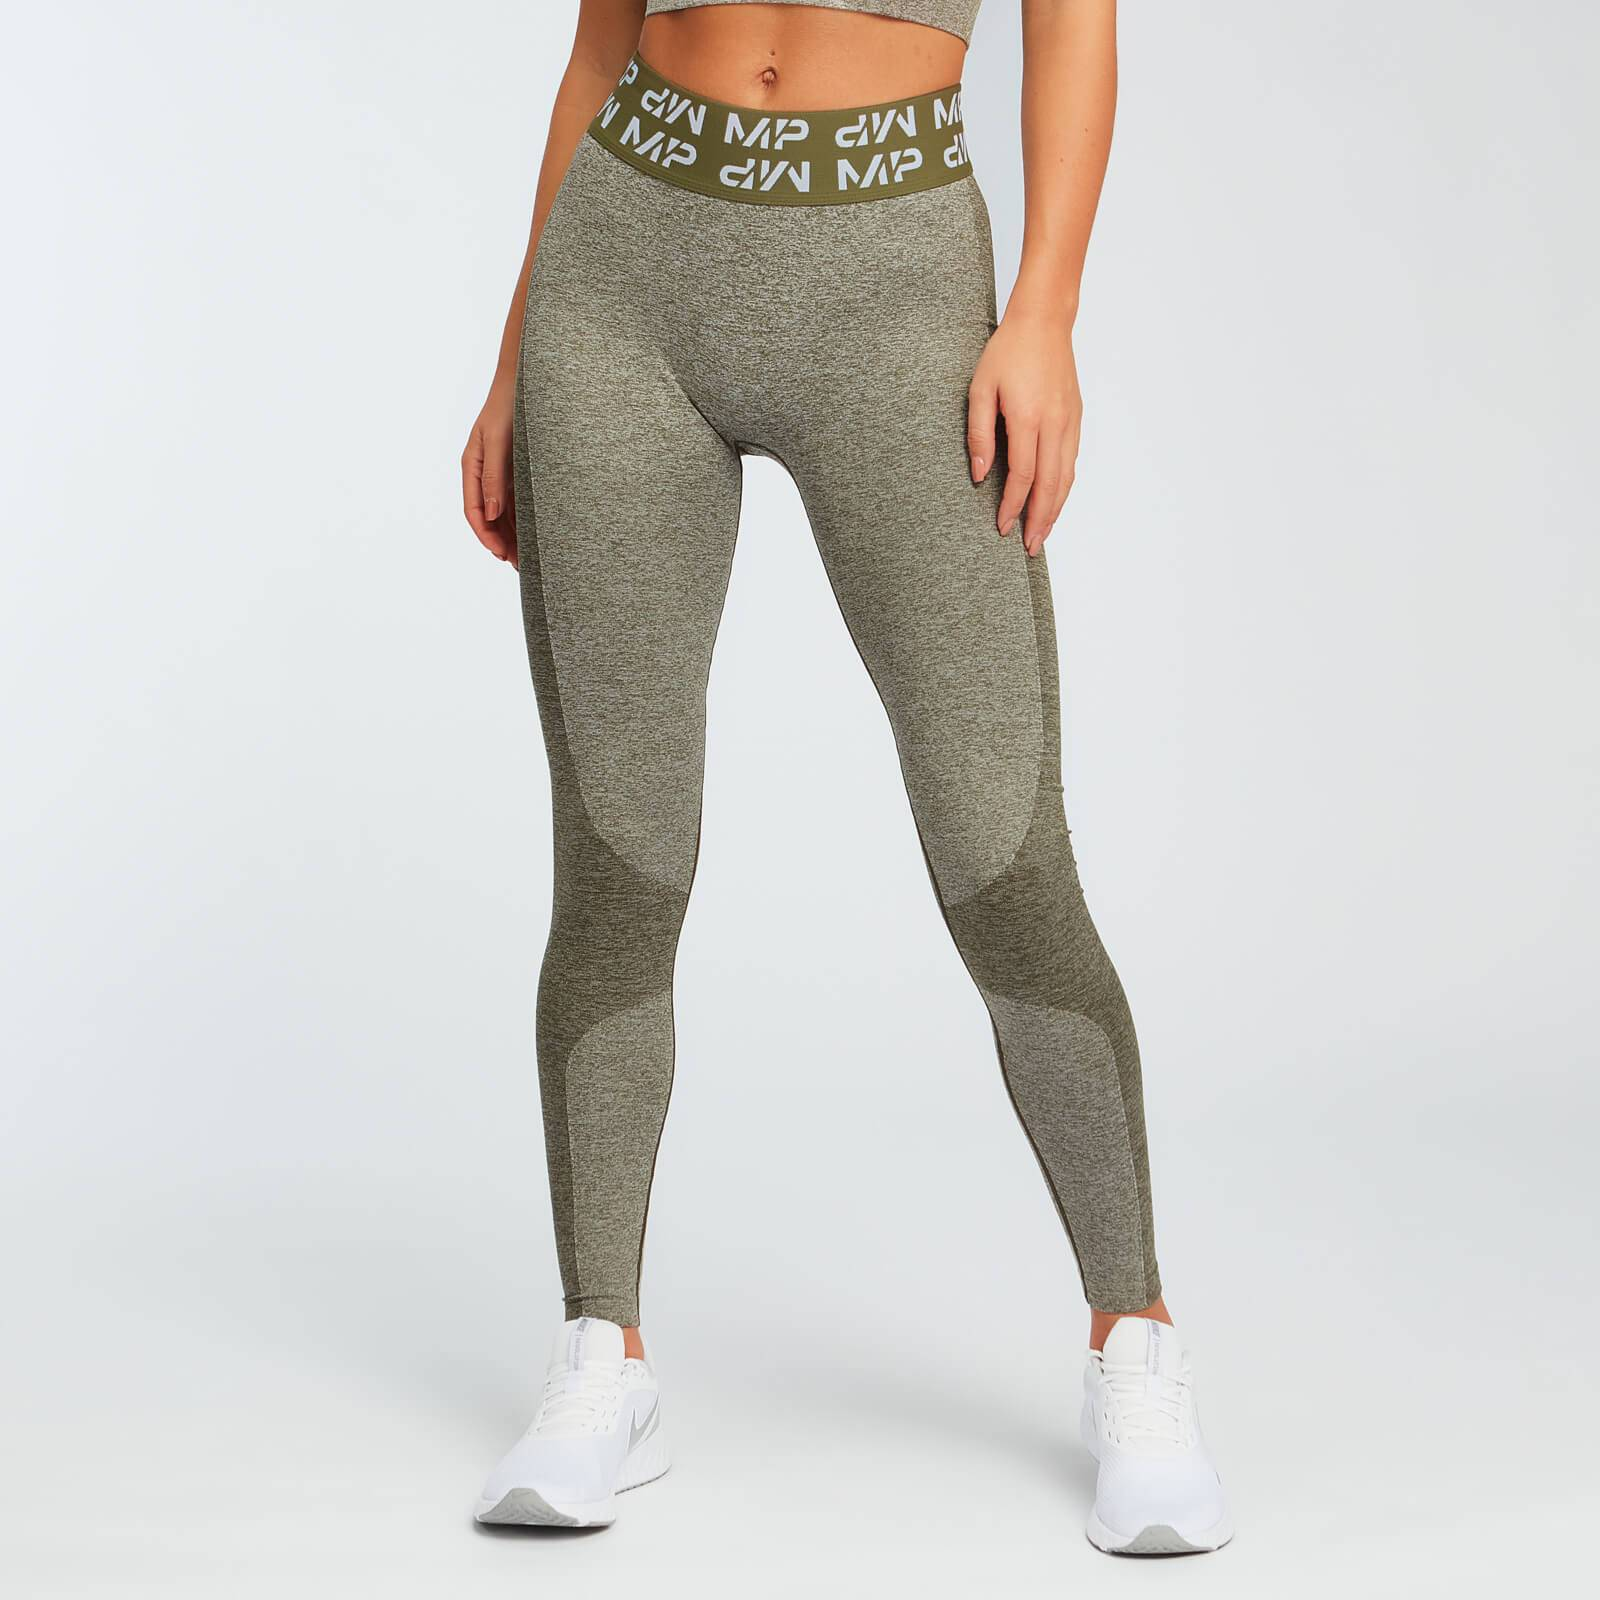 myprotein mp women's curve leggings - brindle - xl